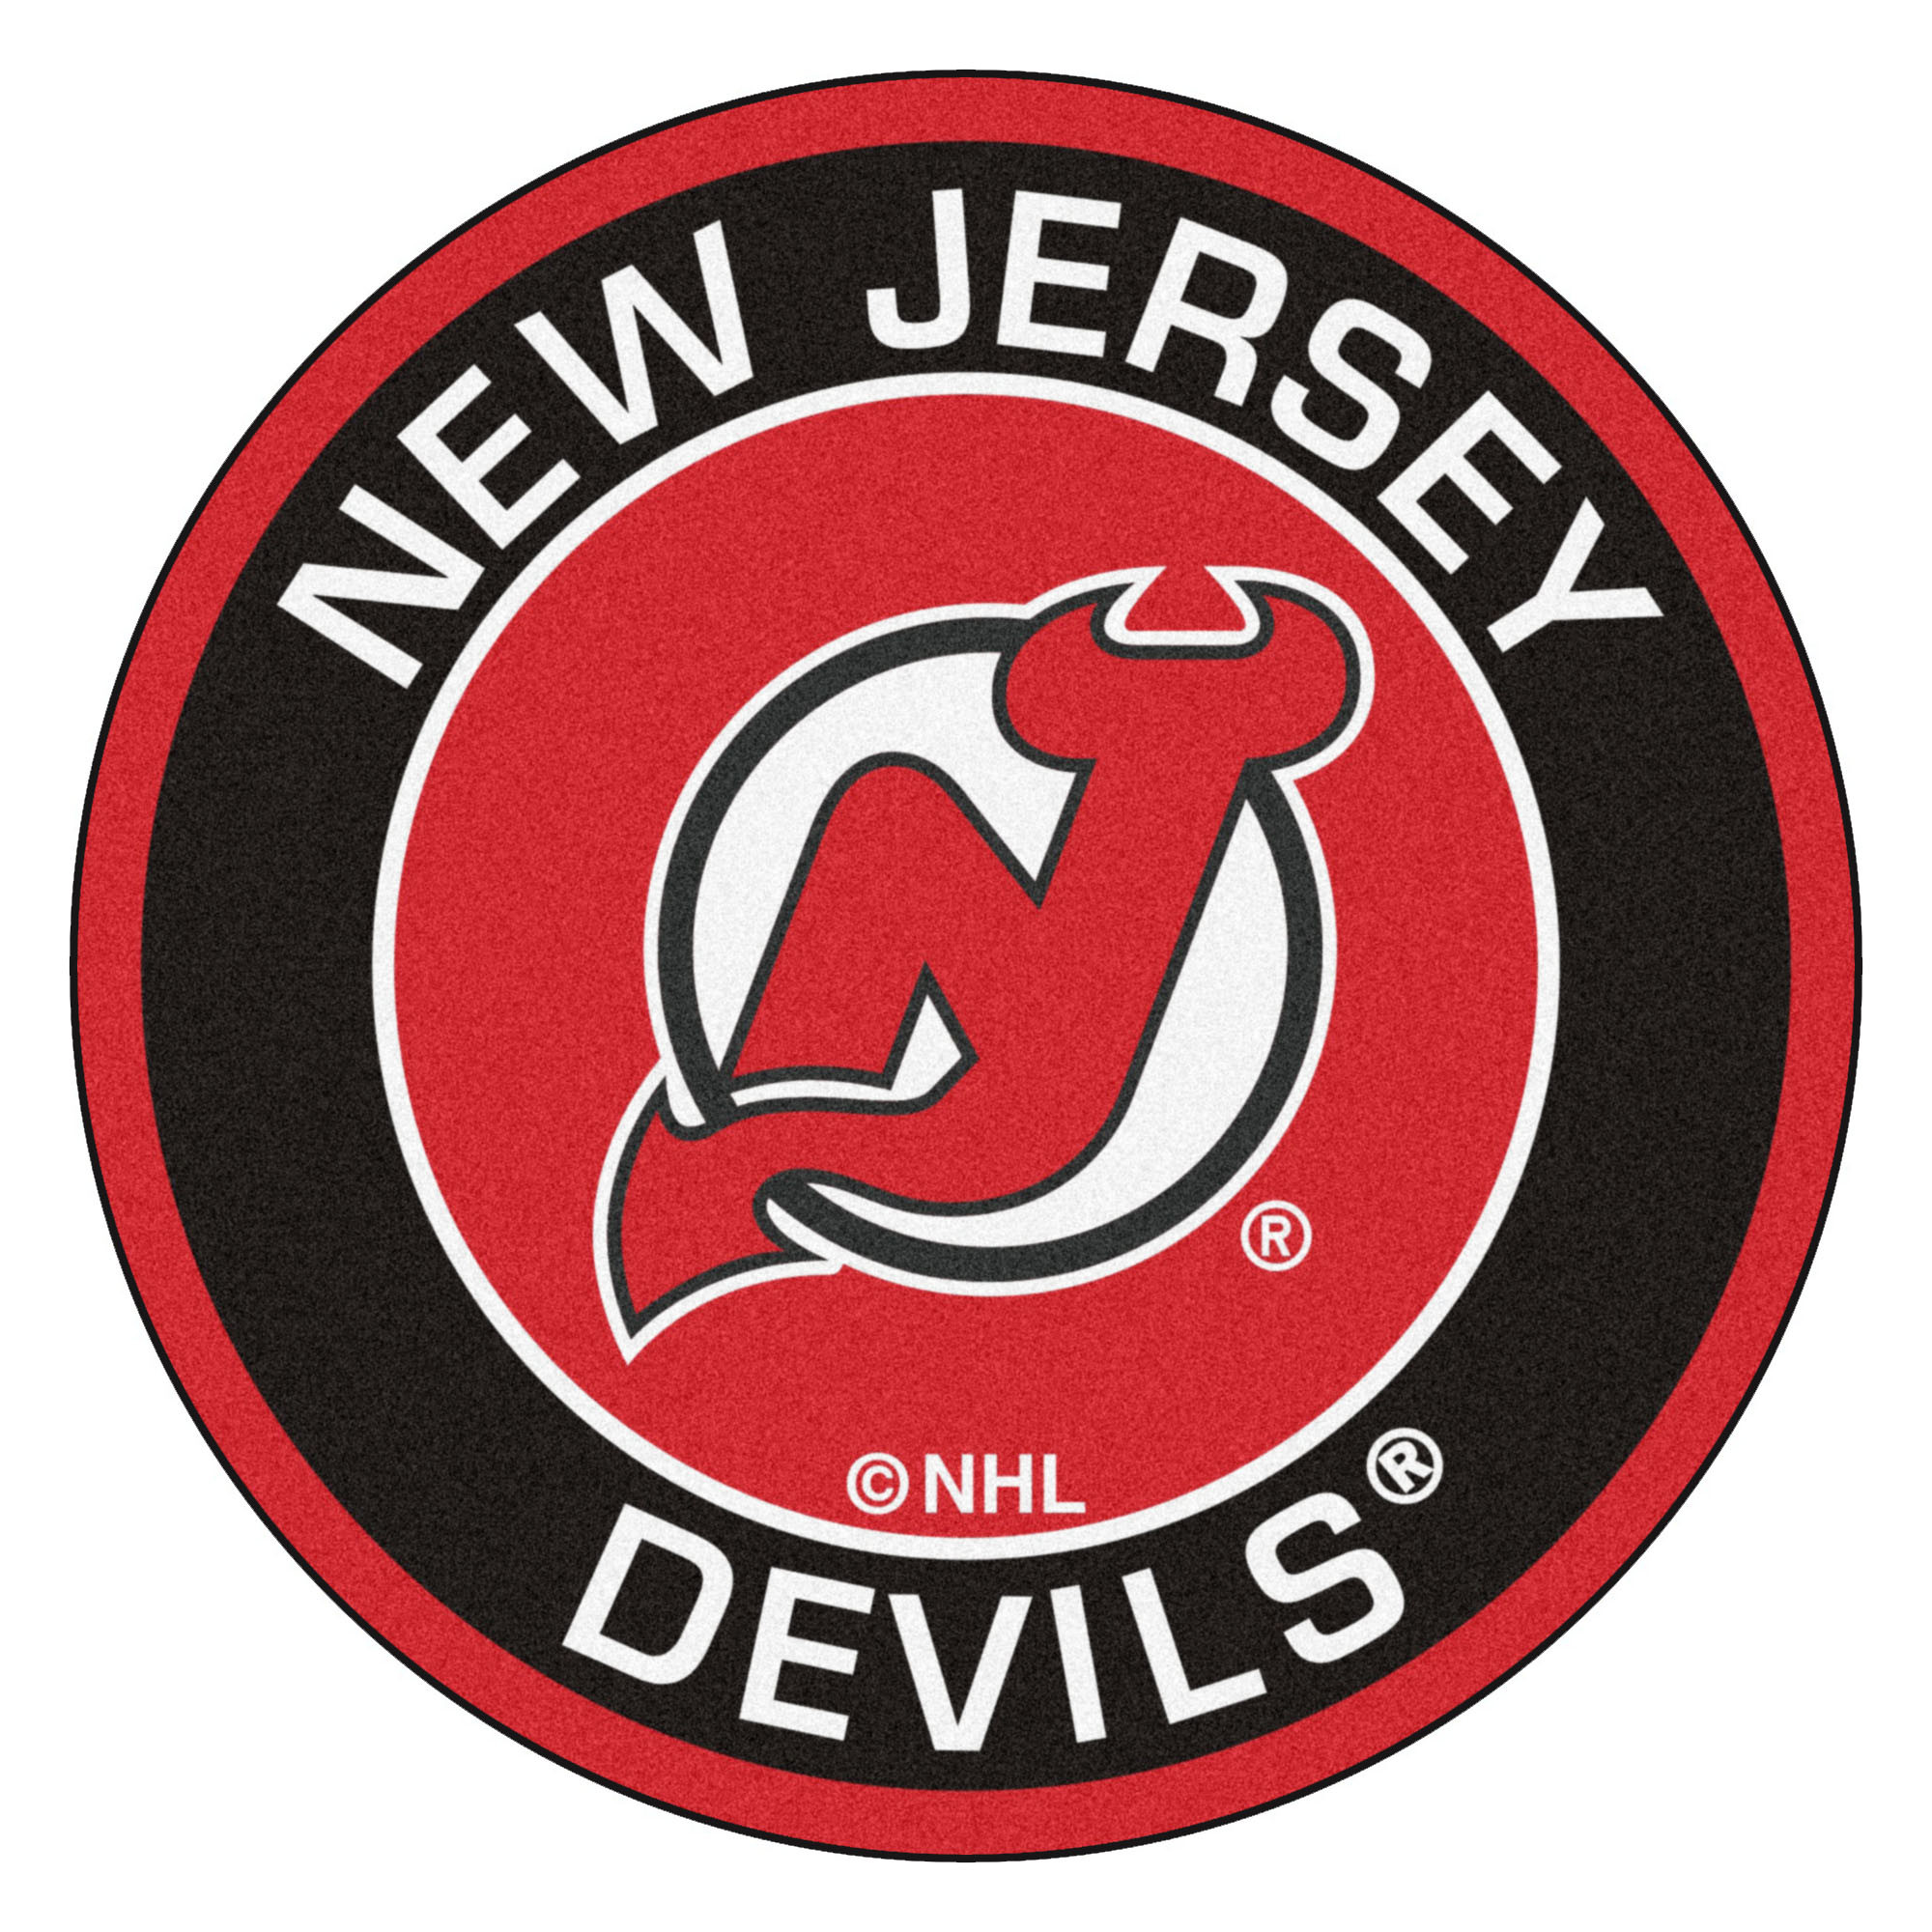 New Jersey Devils Hd Wallpaper 79 Images